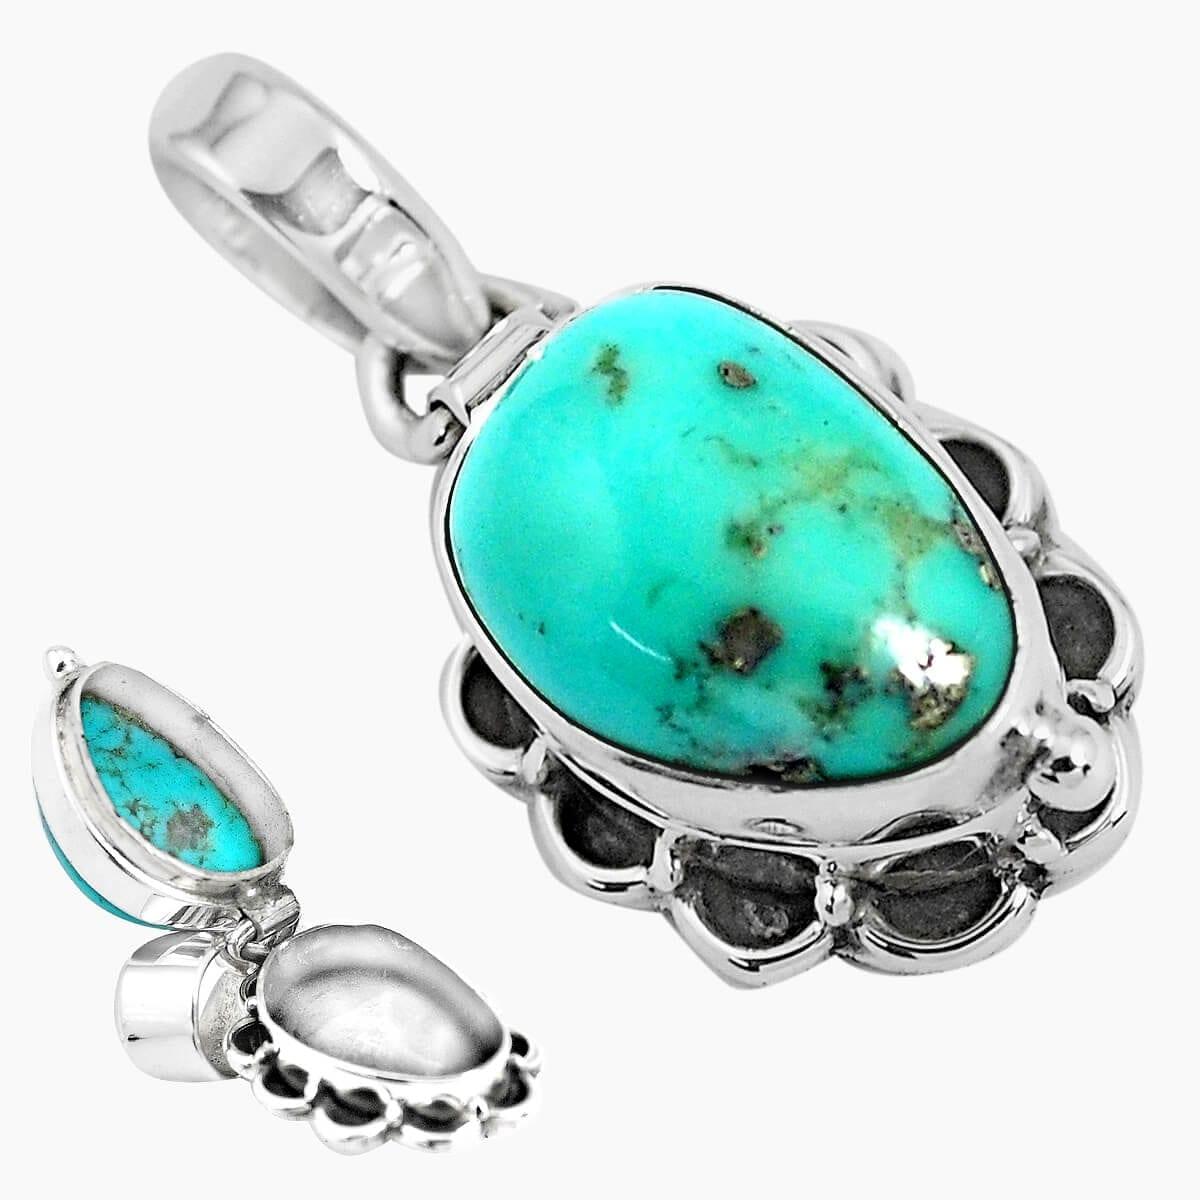 Sterling Silver Turquoise Secret Message Locket - 5.2 grams